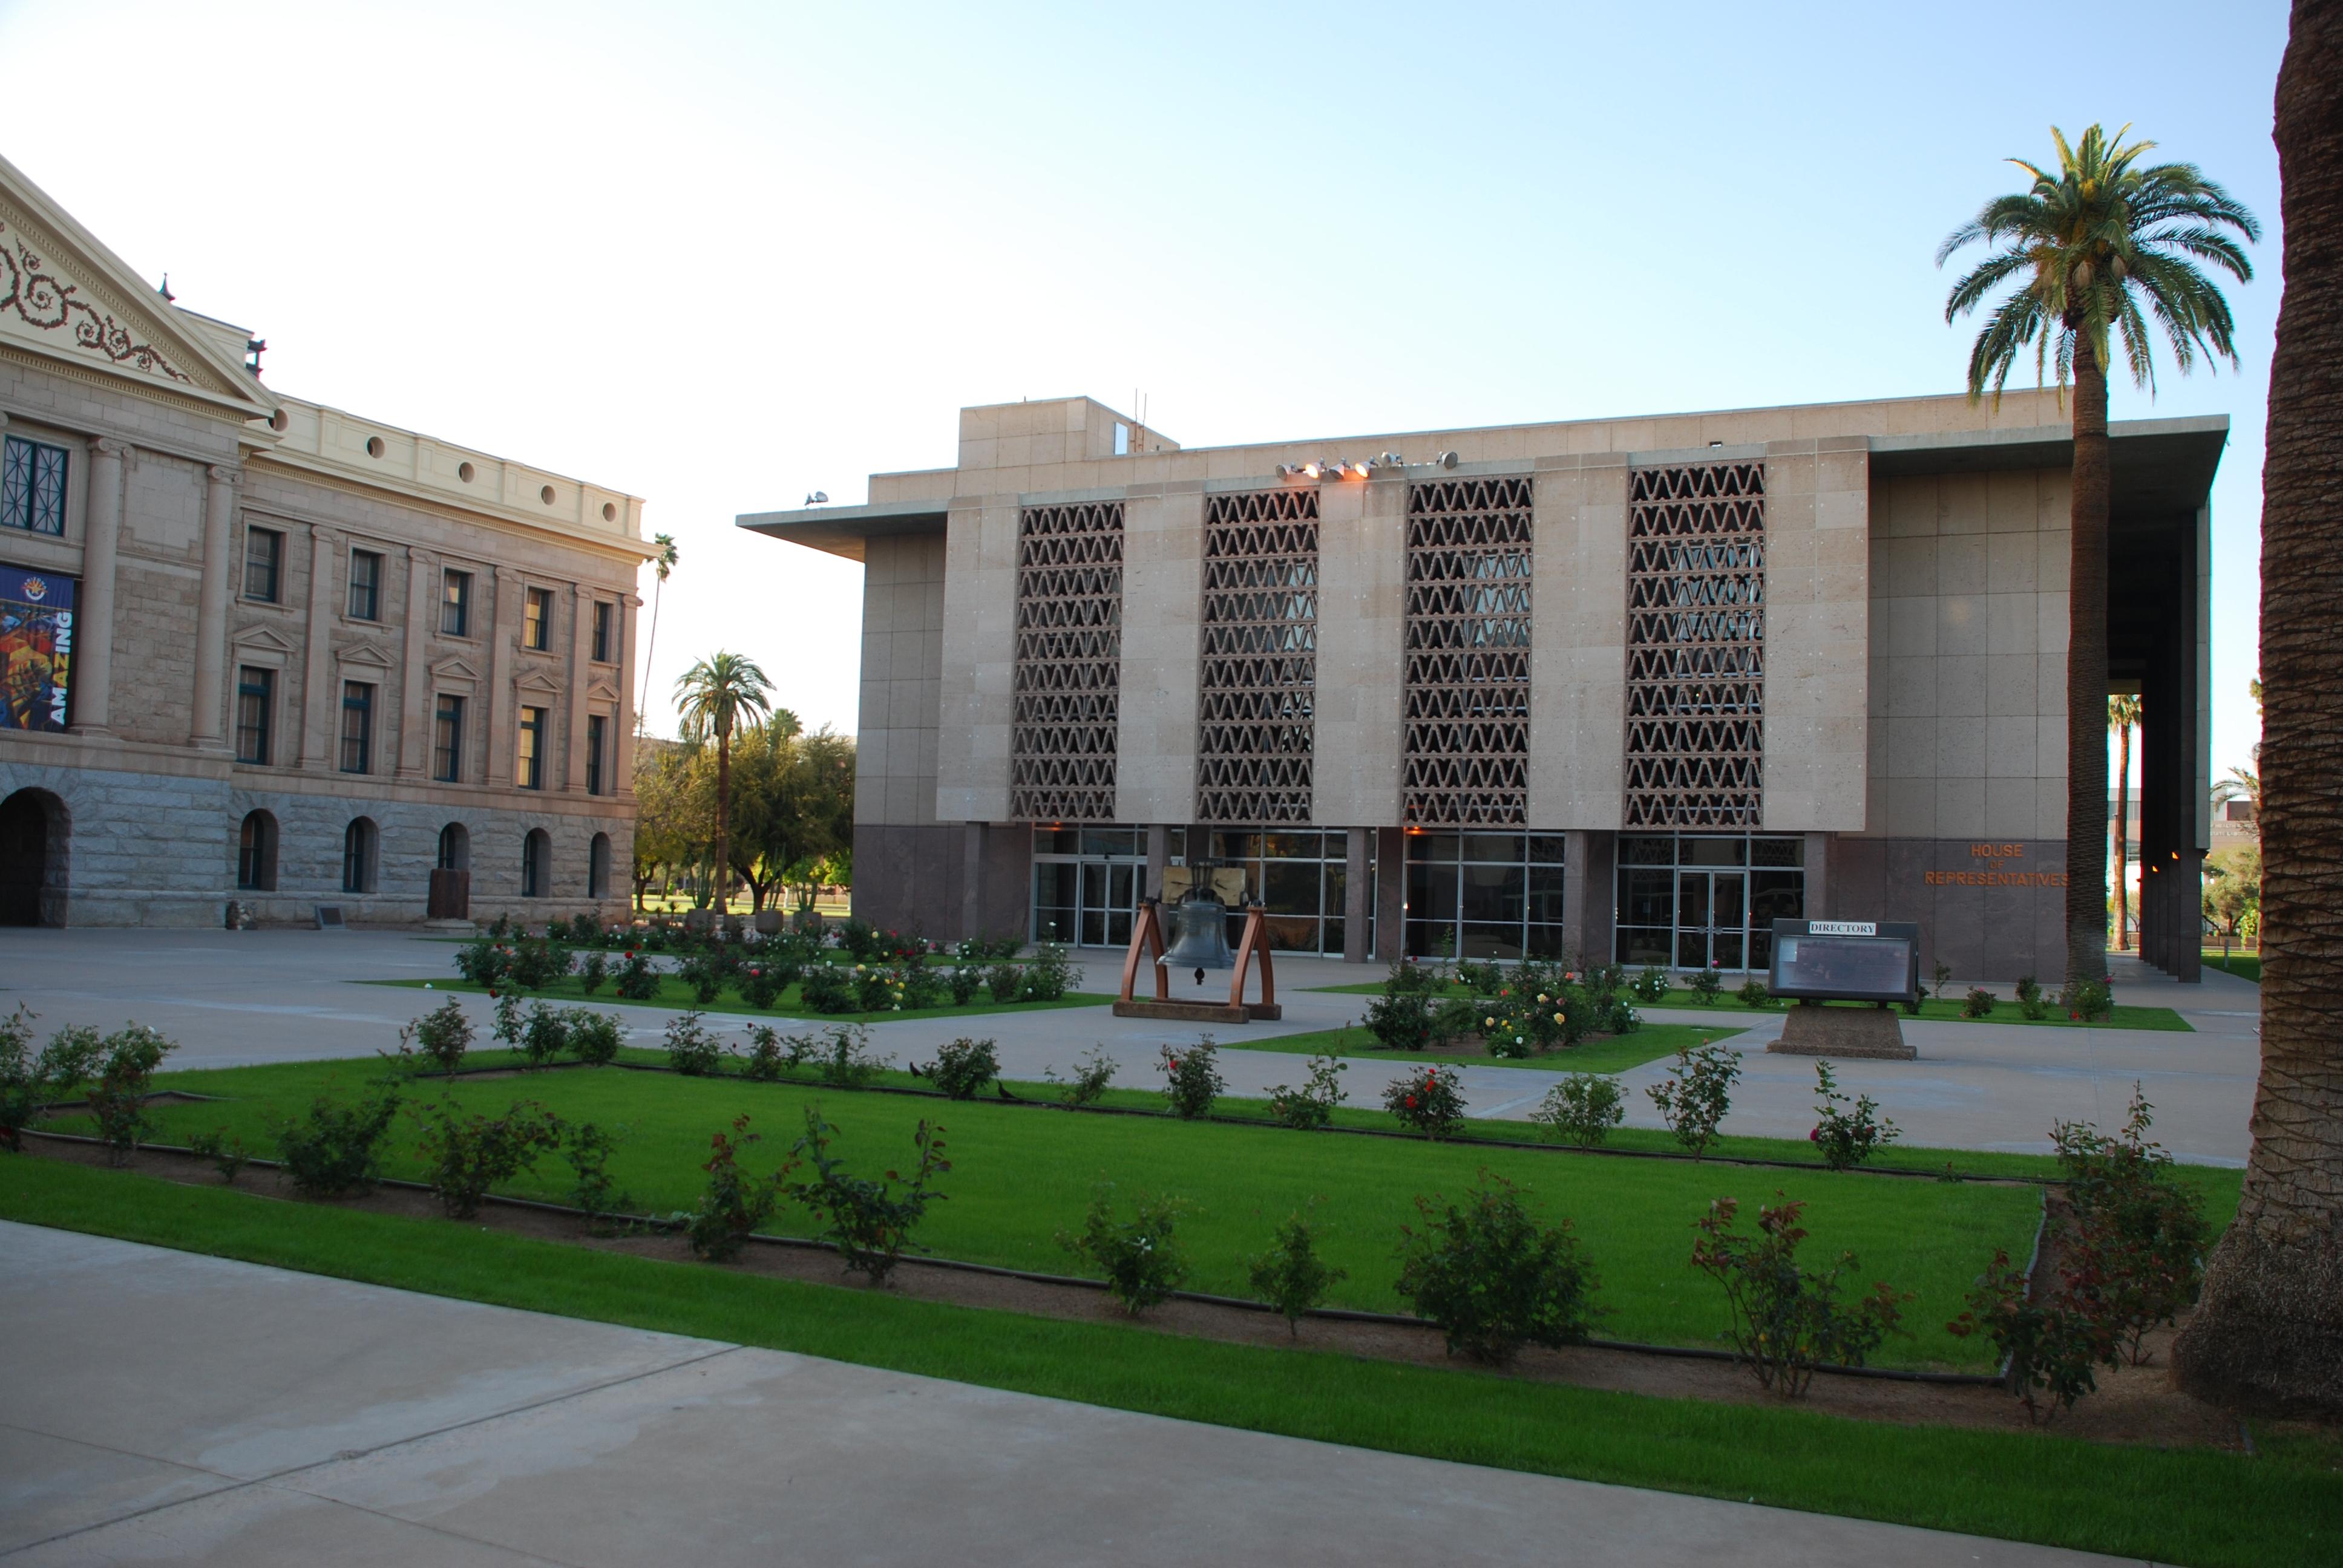 Arizona State Representatives >> File Arizona State Capitol House Of Representatives Dsc 2702